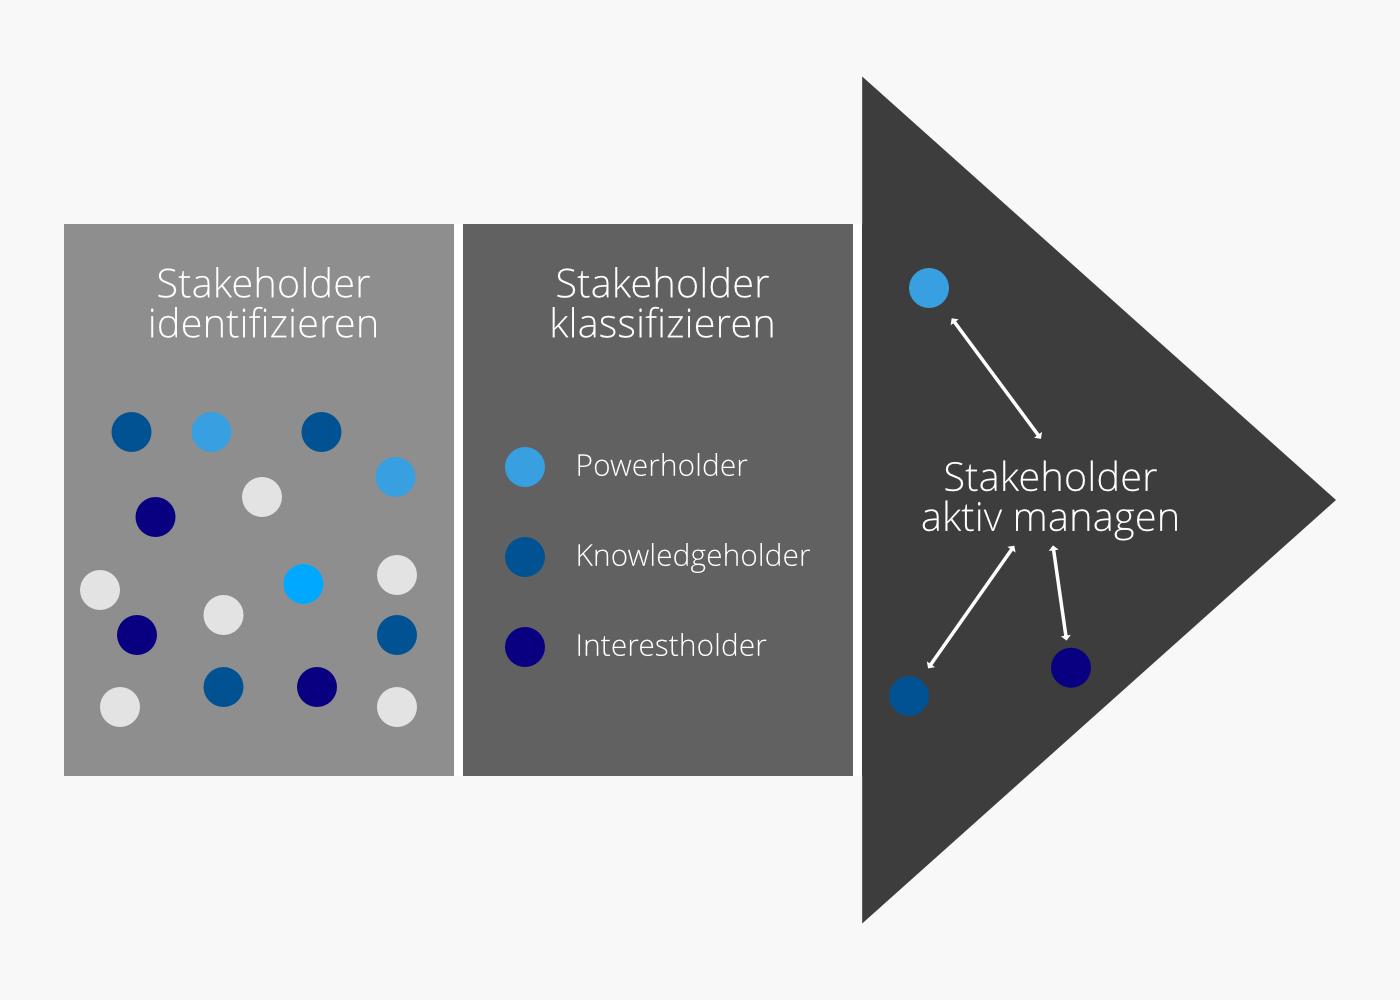 knowledge holder, interest holder, power holder, powerholder, knowledgeholder, stakeholder analyse, interestholder,